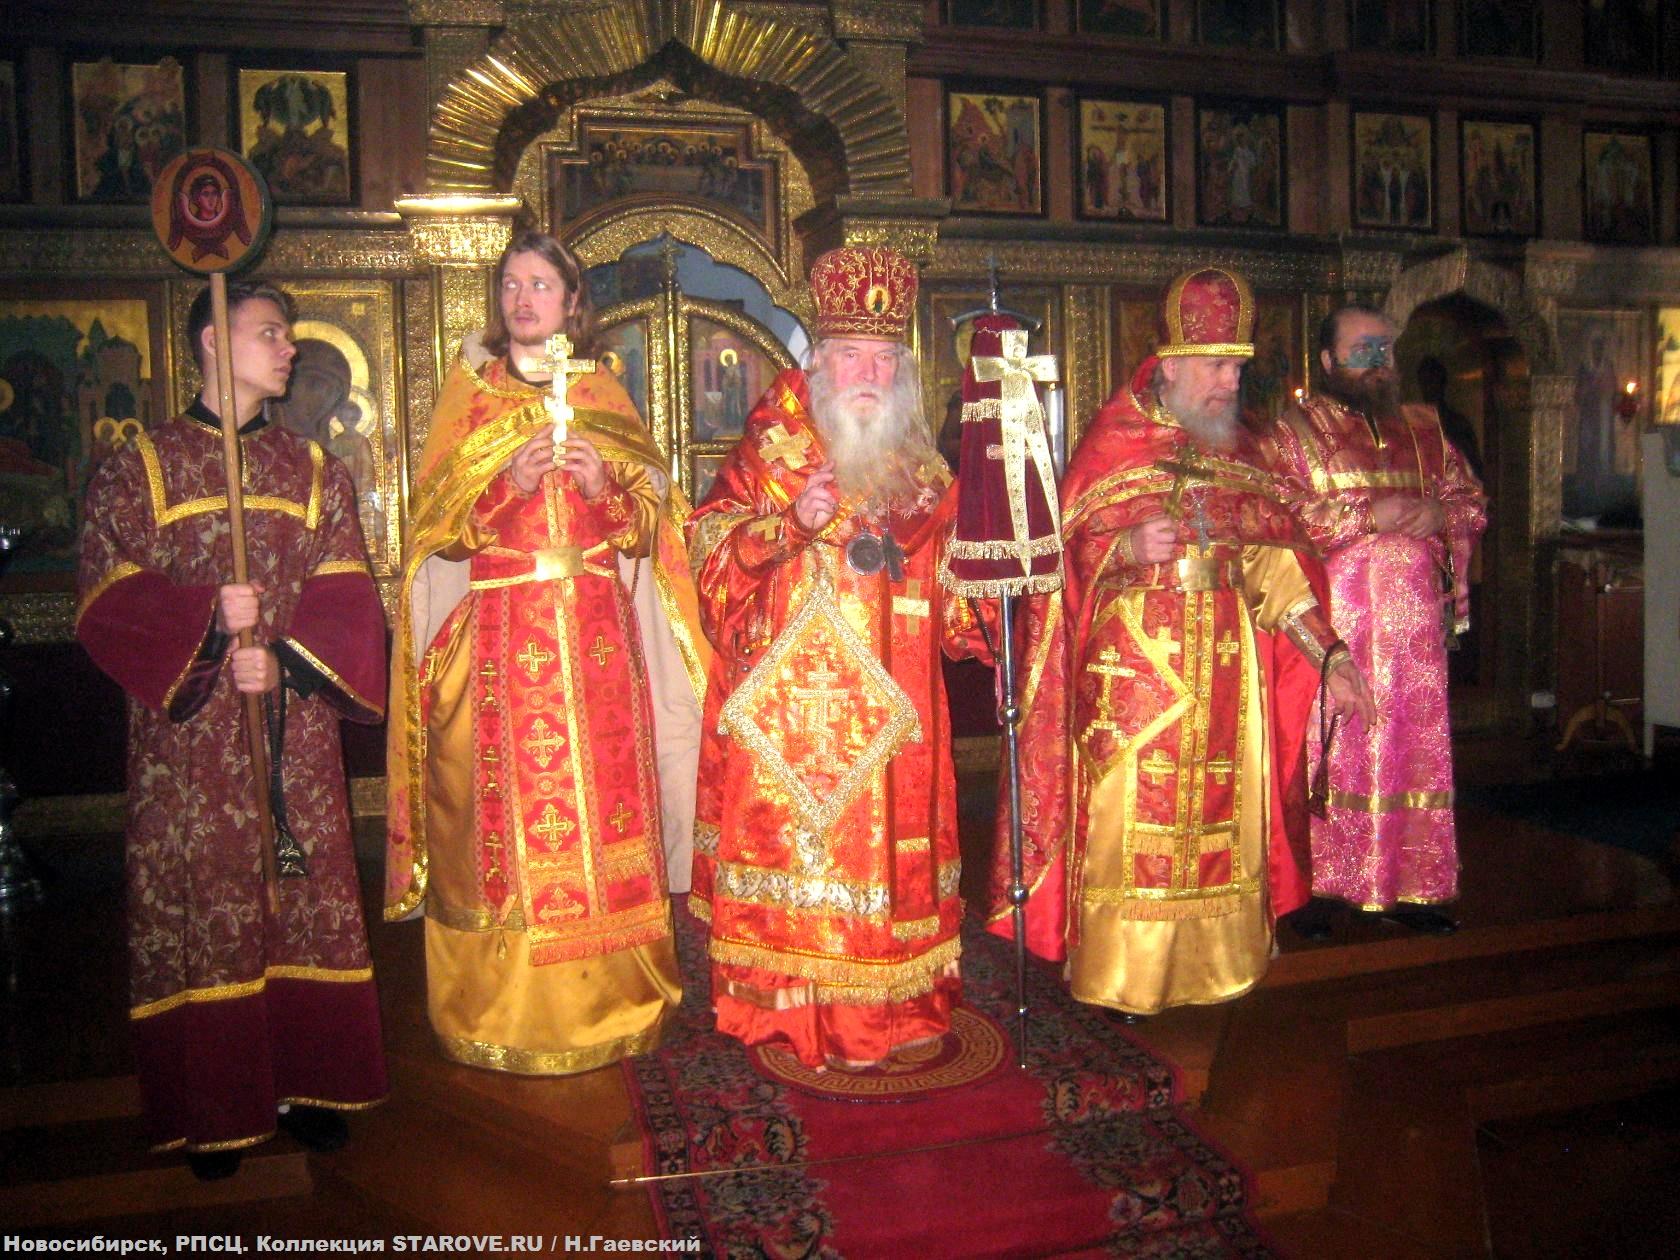 РПСЦ, РПЦ МП, Силуян, Силуан, Килин, епископ, Новосибирск, епархия